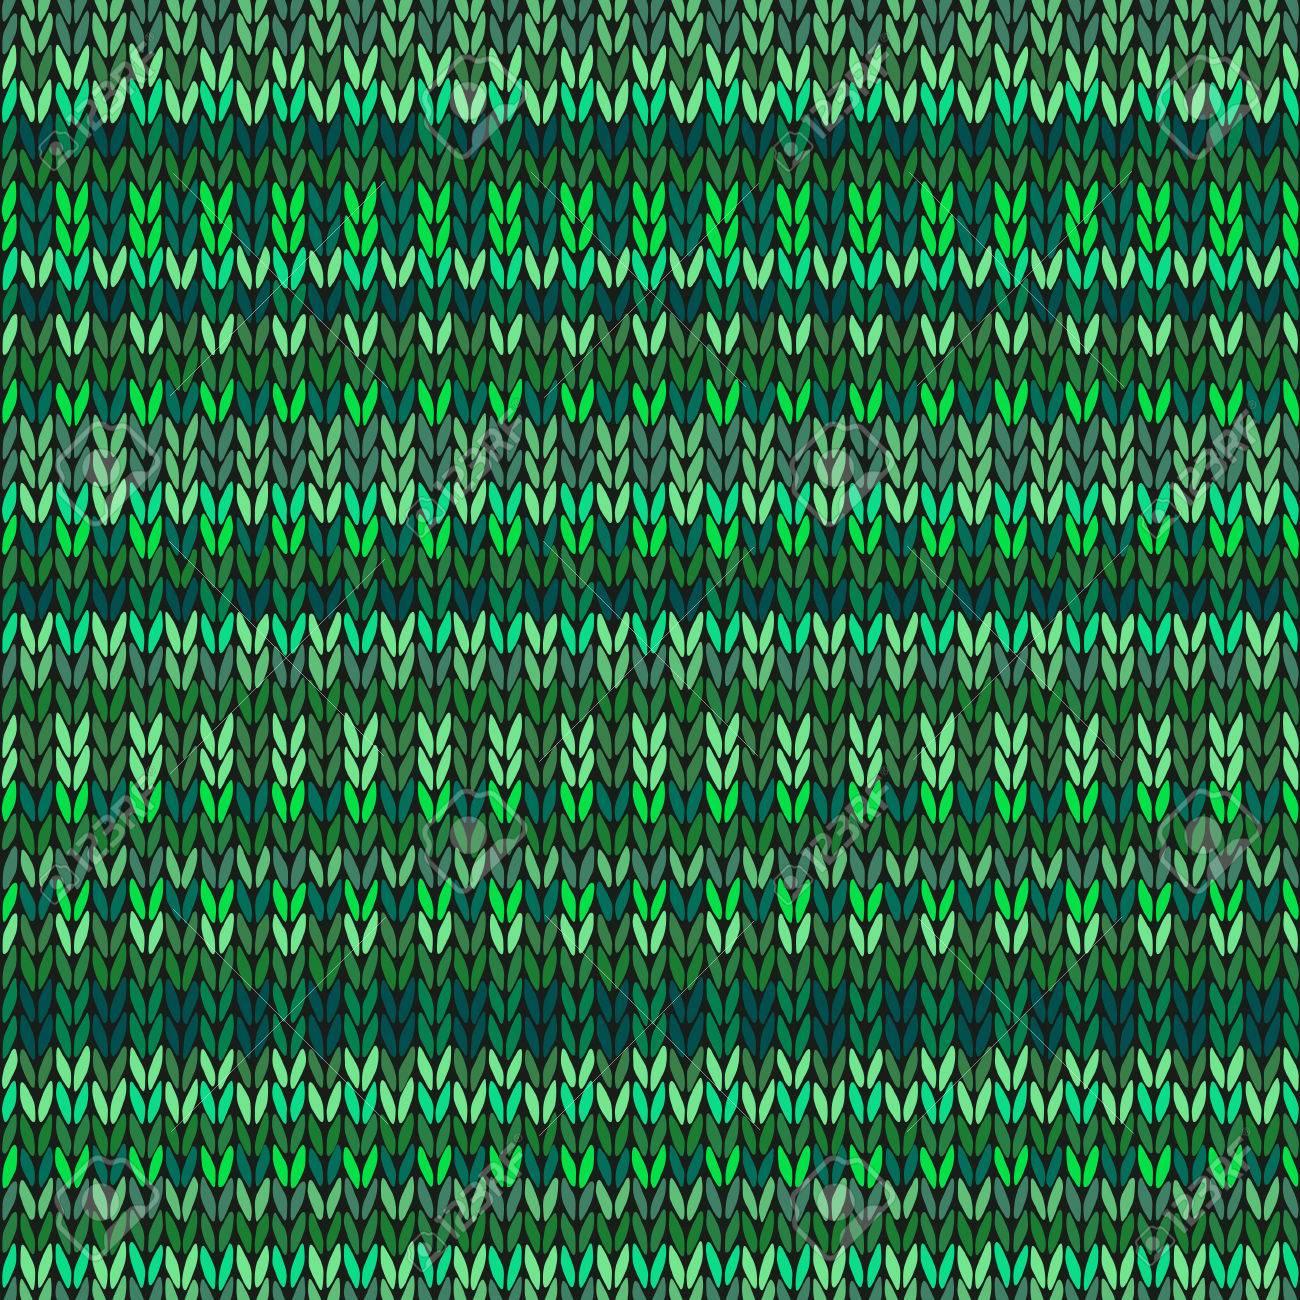 Fancy Strickmuster Programm Sketch - Decke Stricken Muster ...